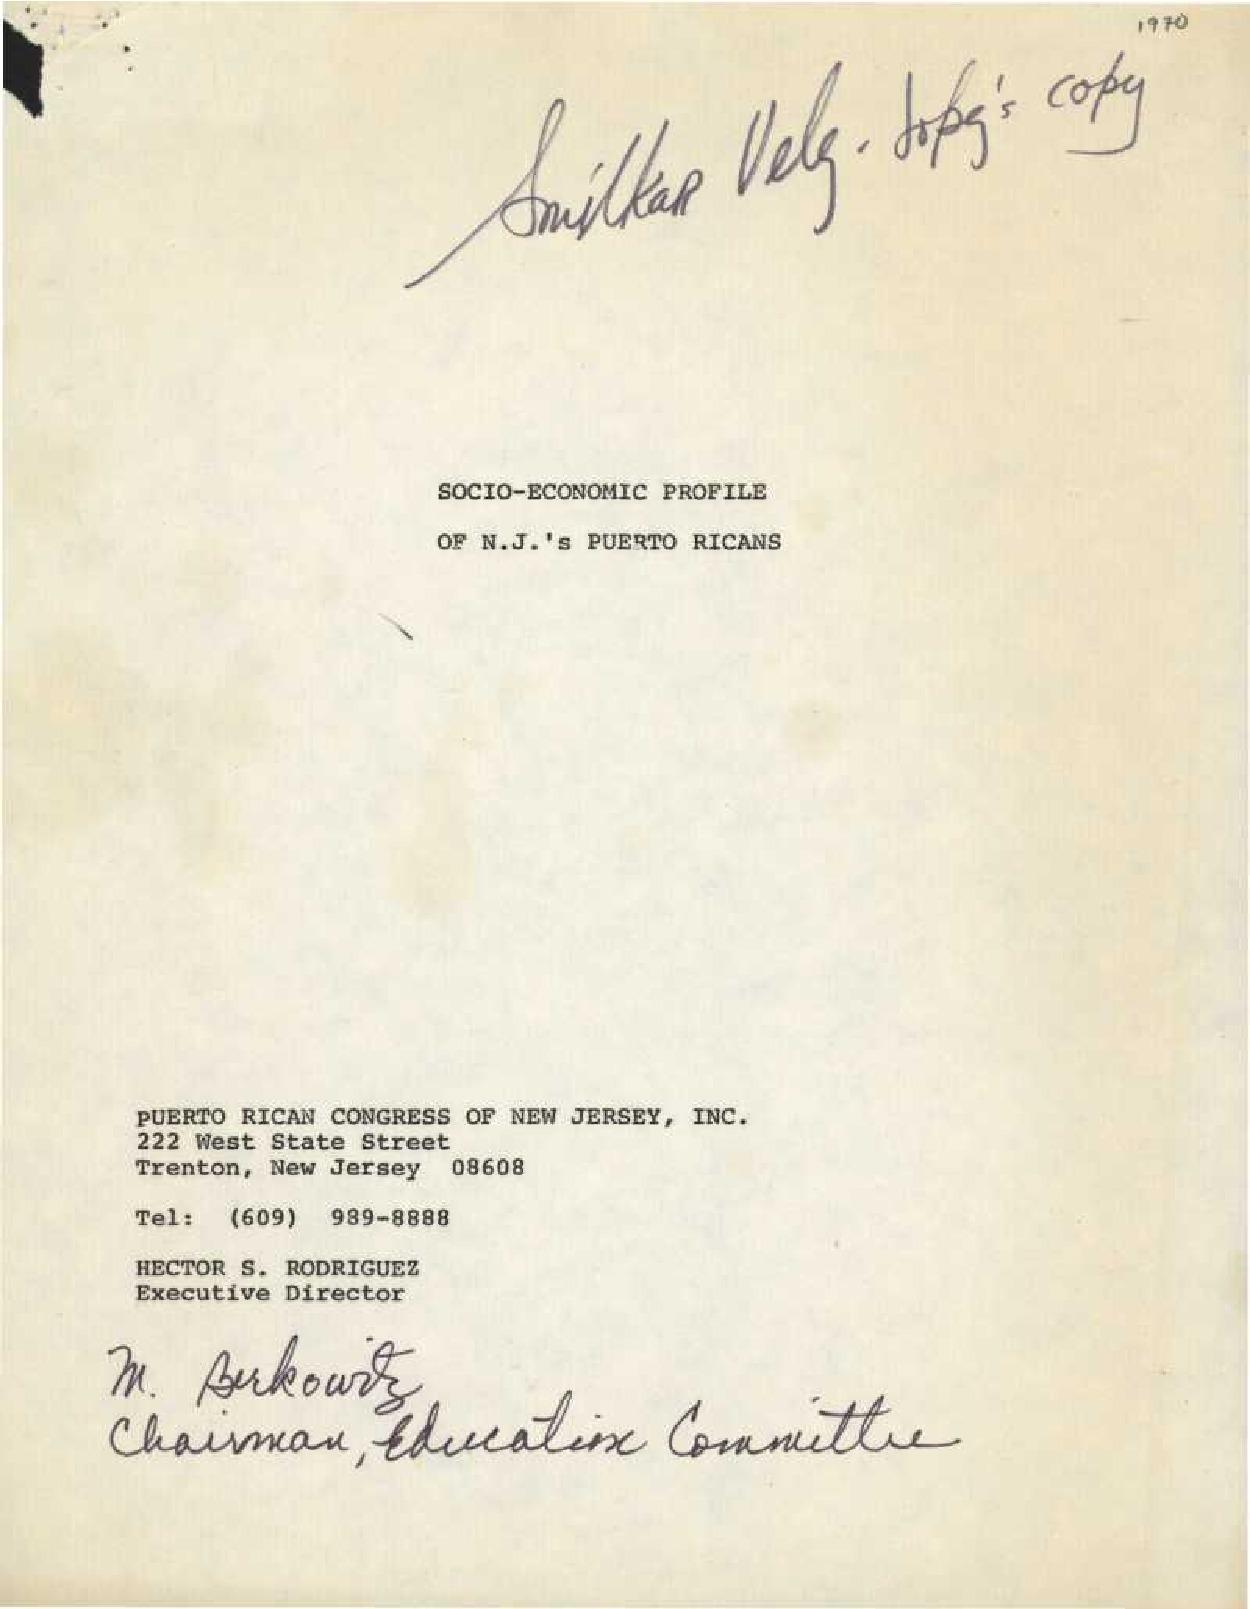 Socio-Economic Profile of NJ's Puerto Ricans (1972)